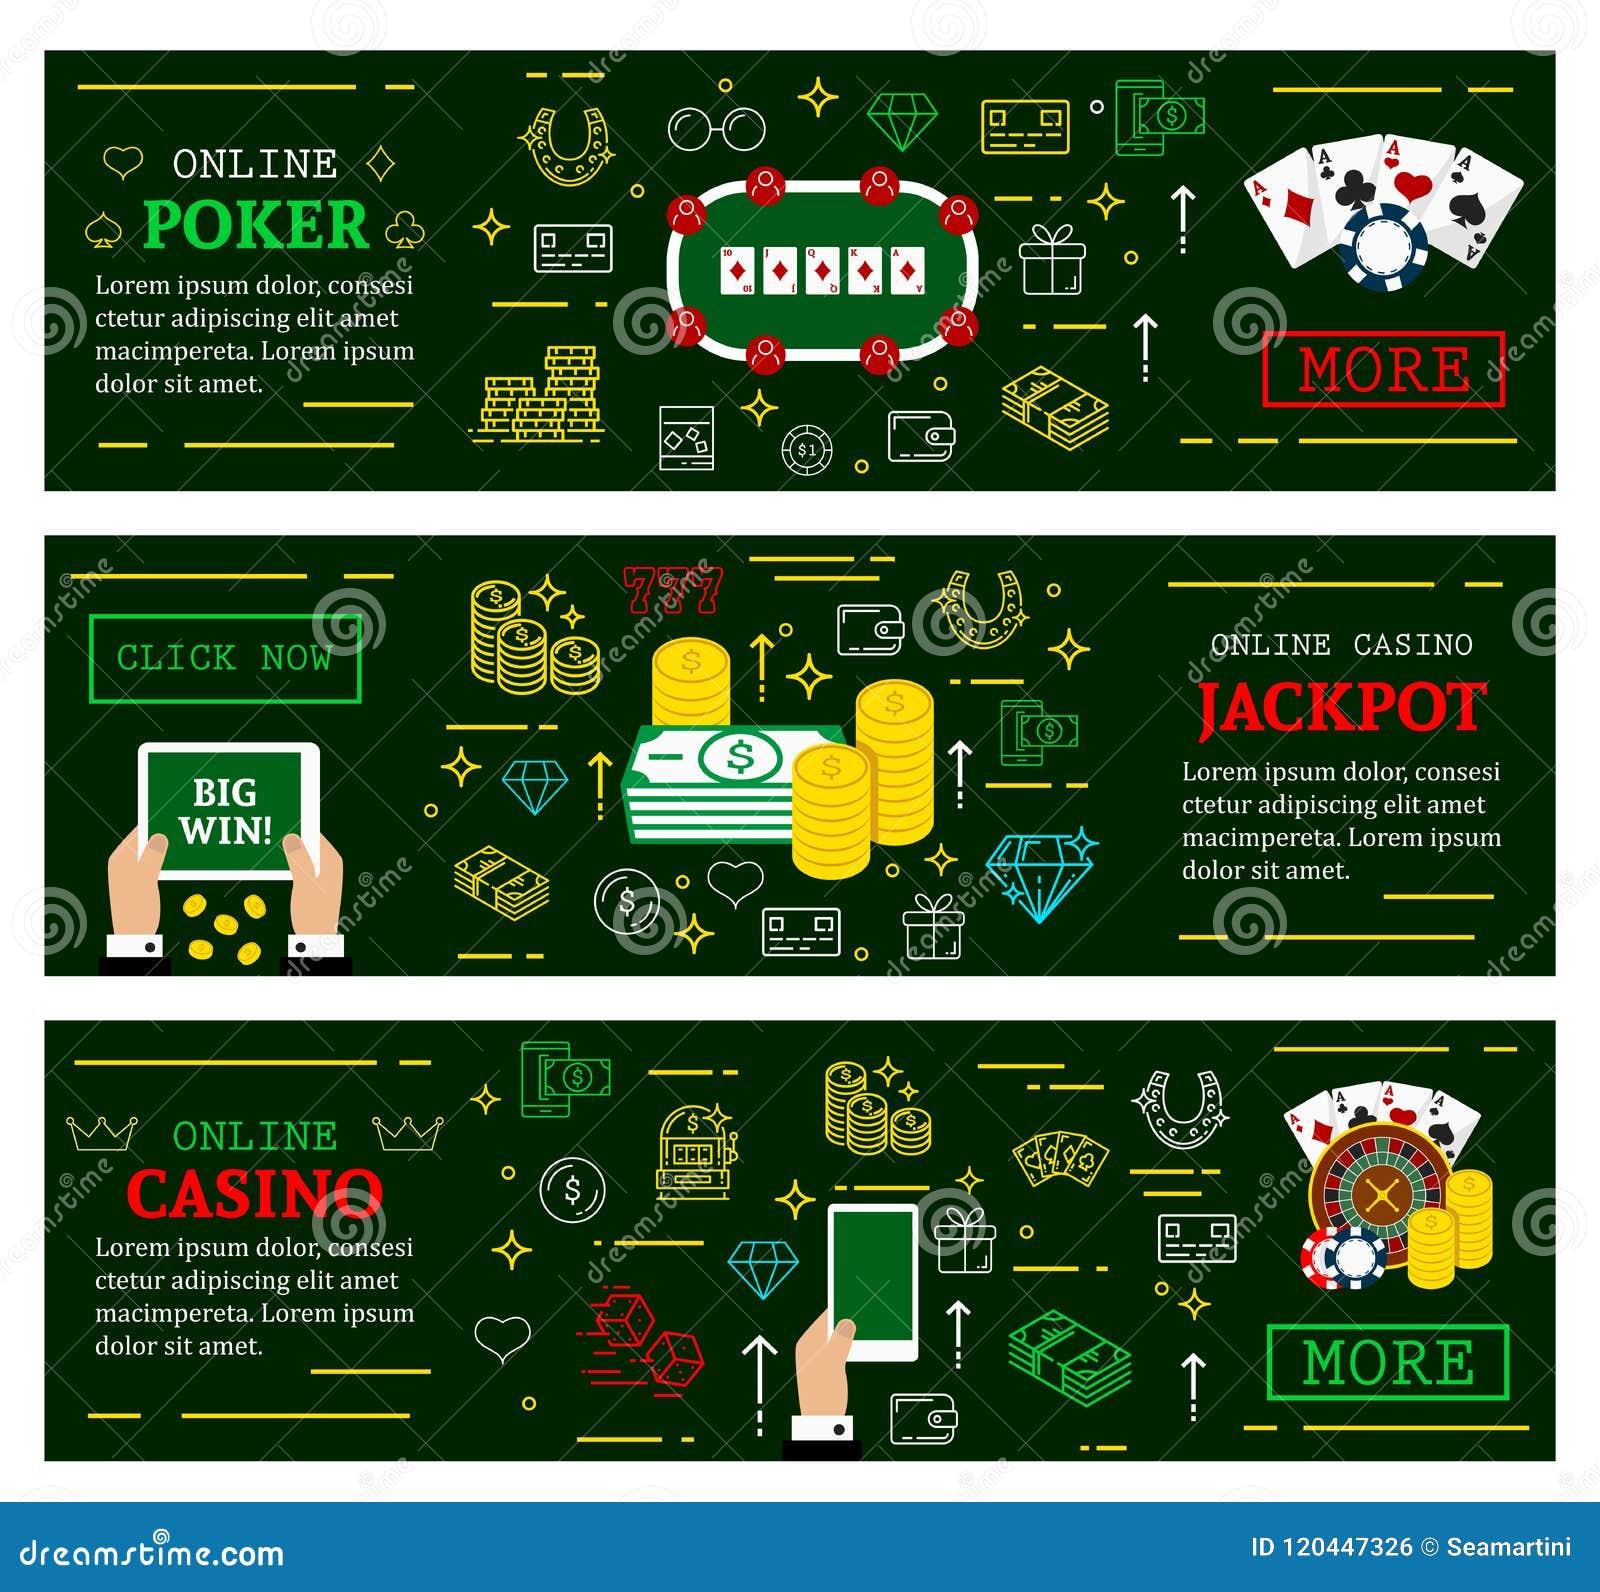 Online Casino Poker Jackpot Vector Web Banners Stock Vector Illustration Of Internet Heart 120447326